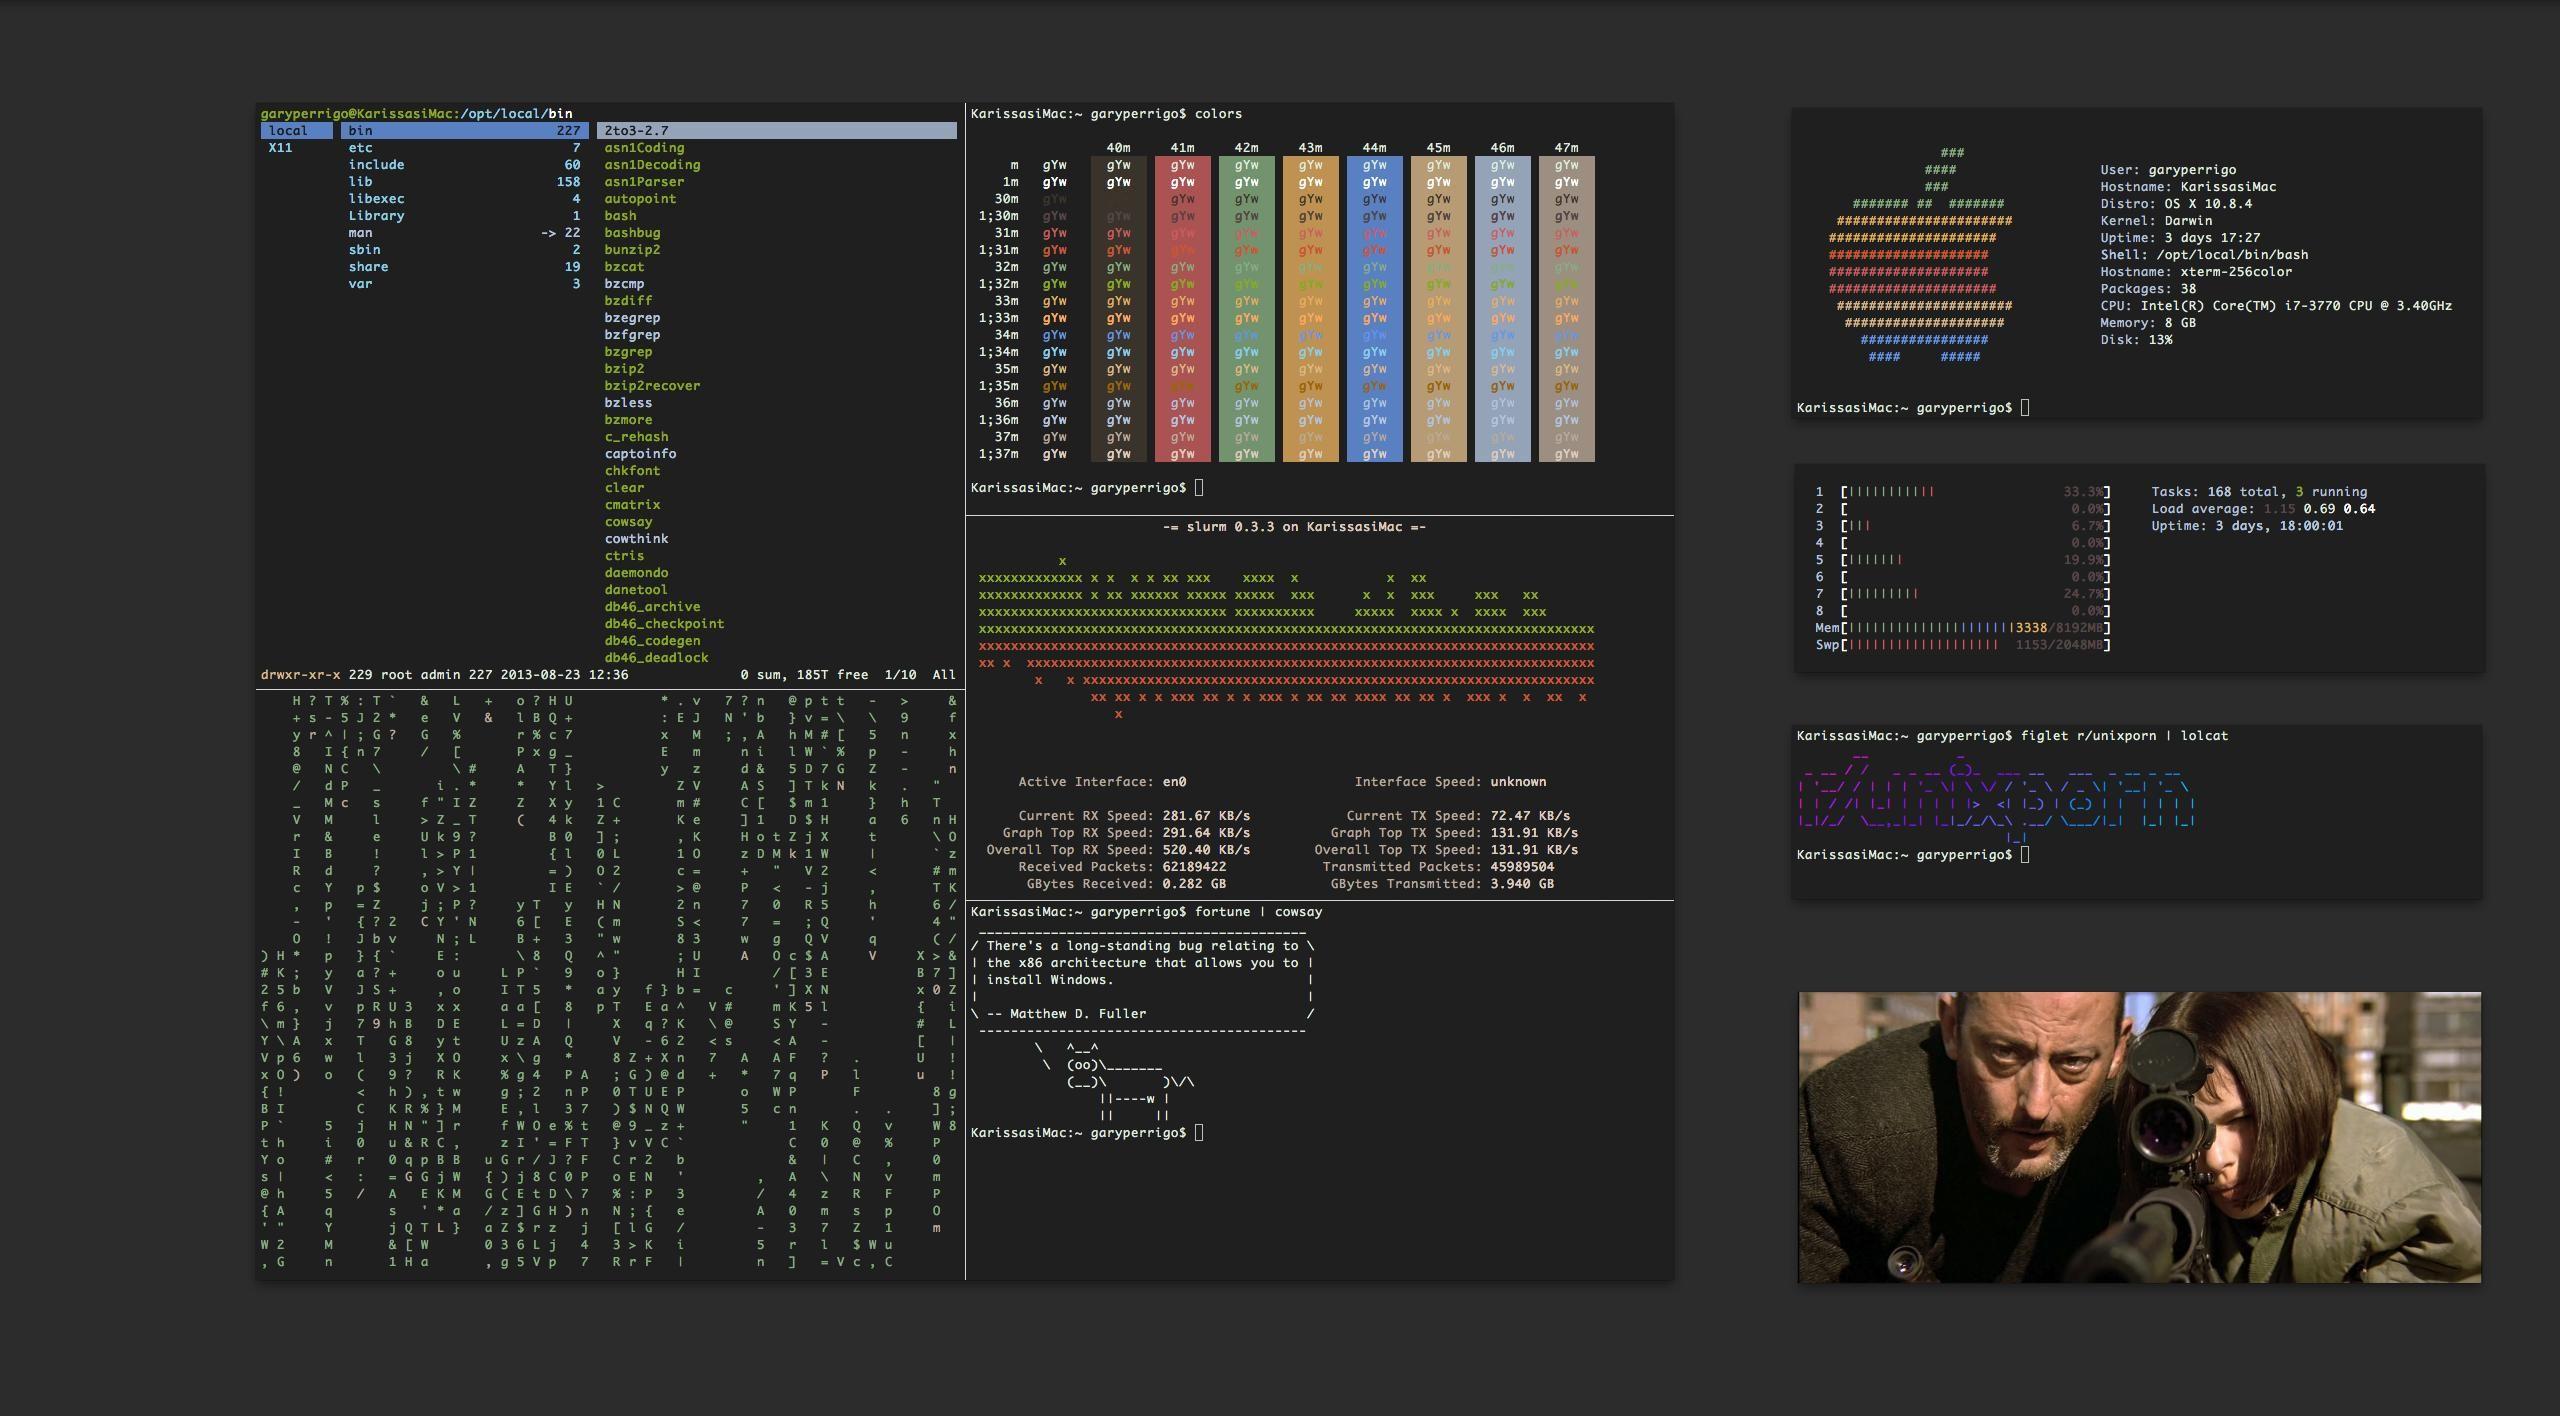 Pin by nil on g desktop in 2019   Linux, Desktop screenshot